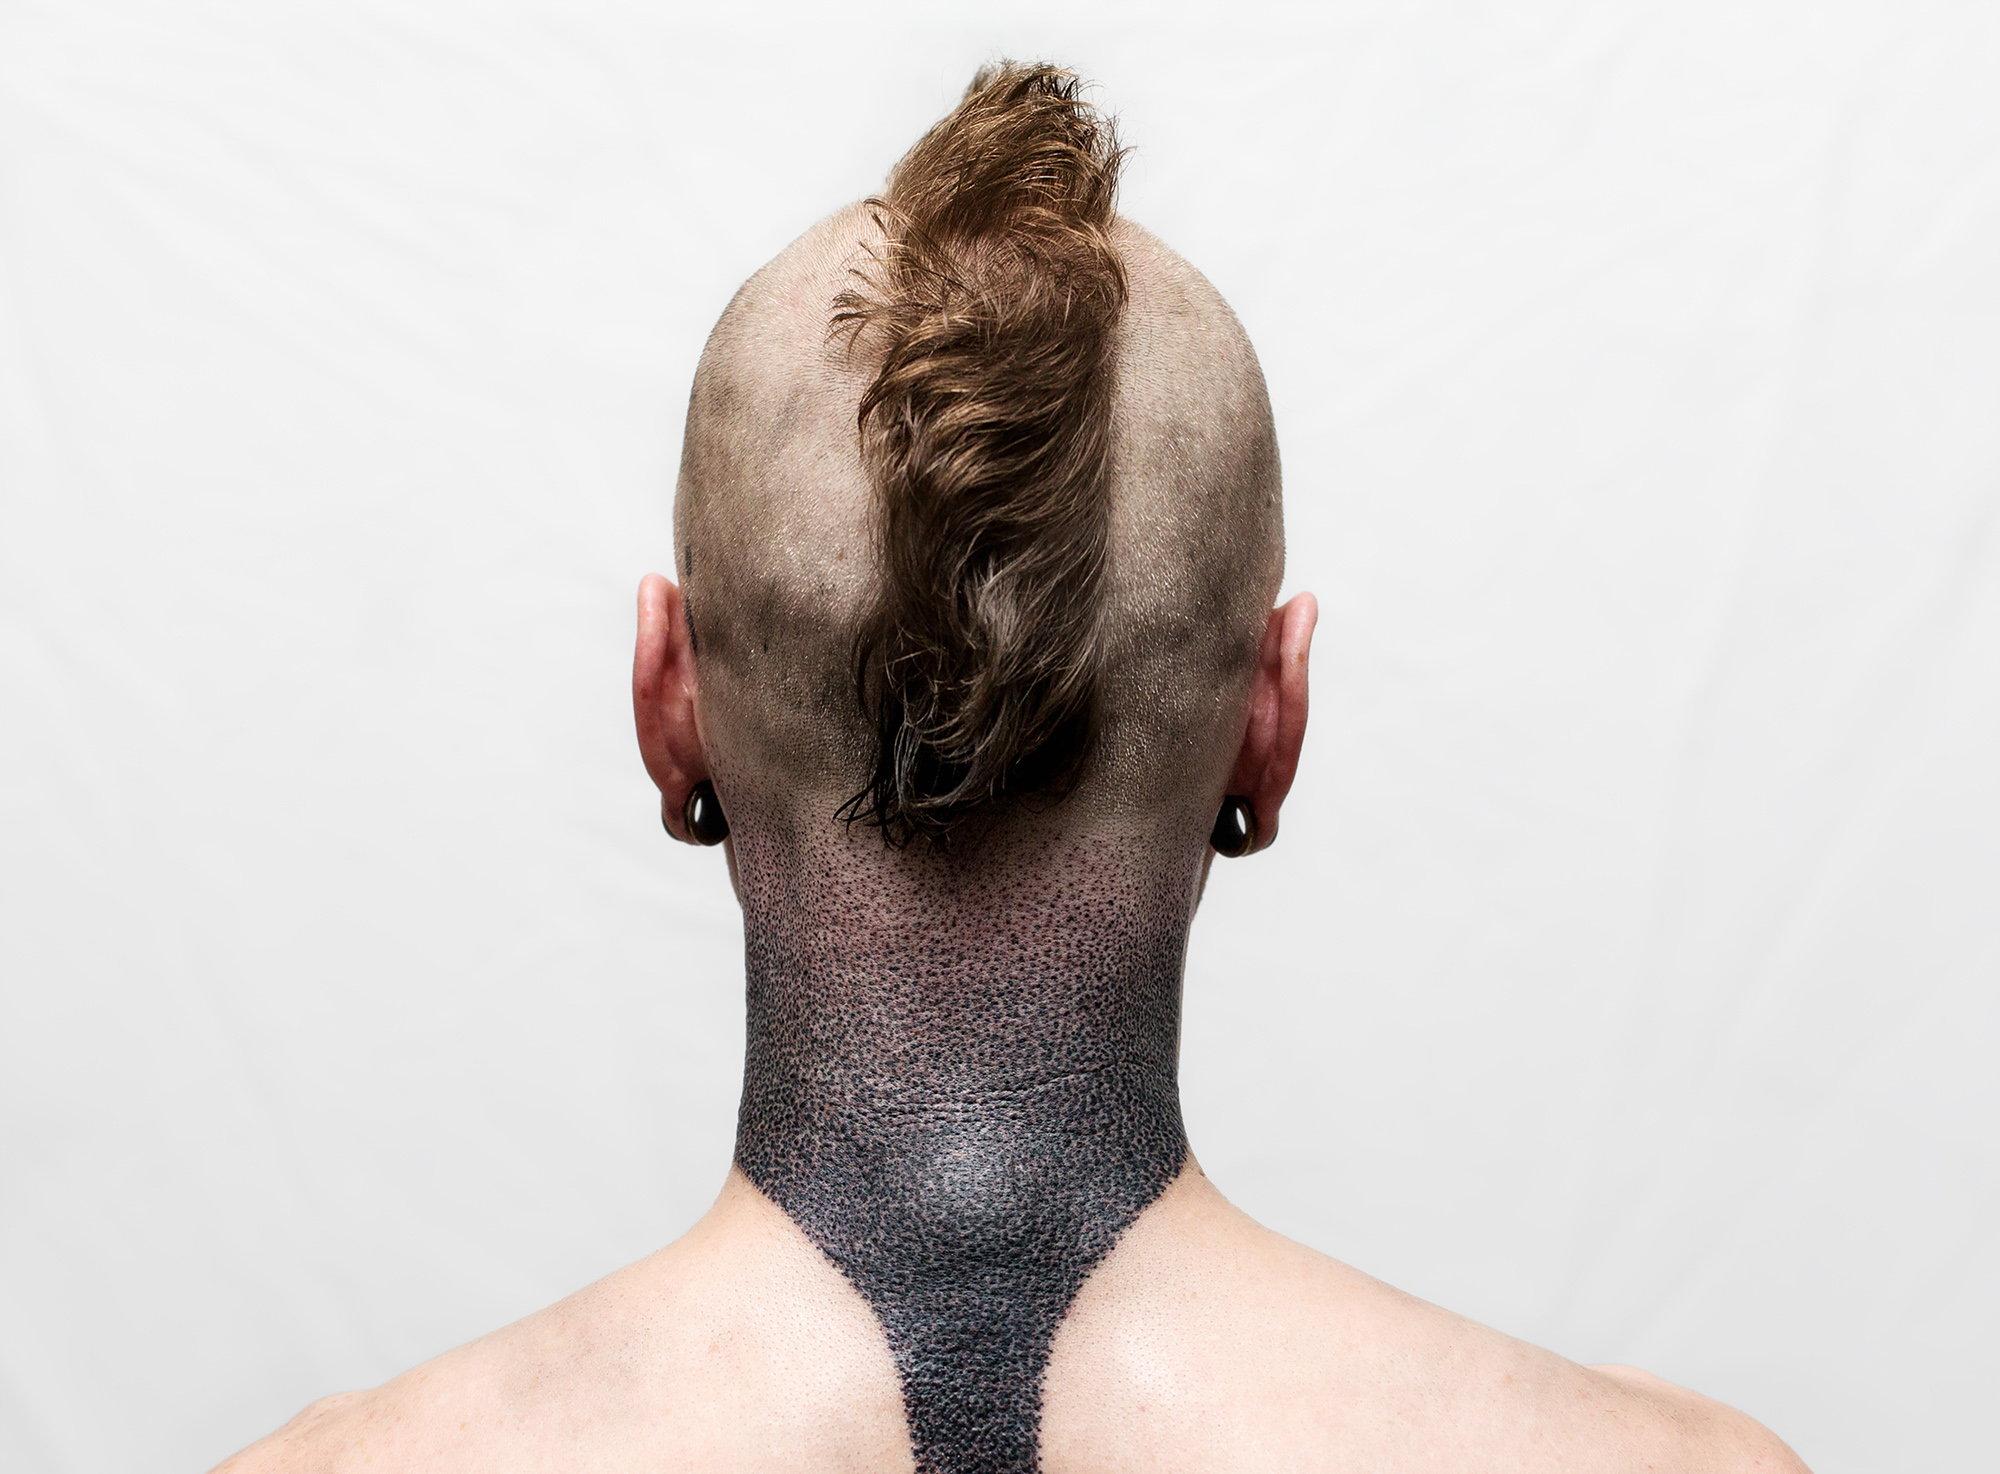 dotwork, chris neck, blackwork minimalist